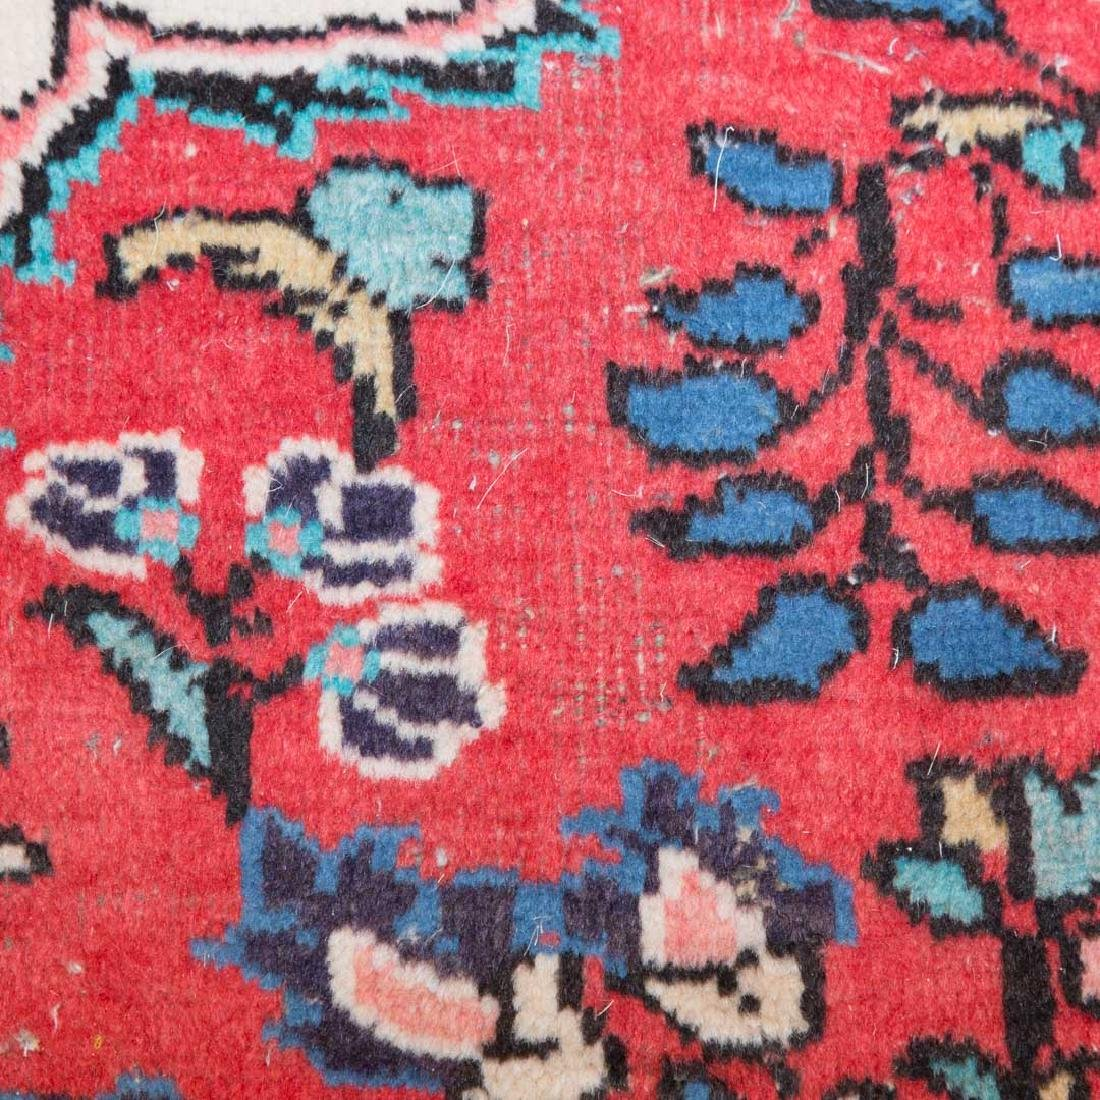 Persian Hamadan rug, approx. 4.1 x 6.6 - 4